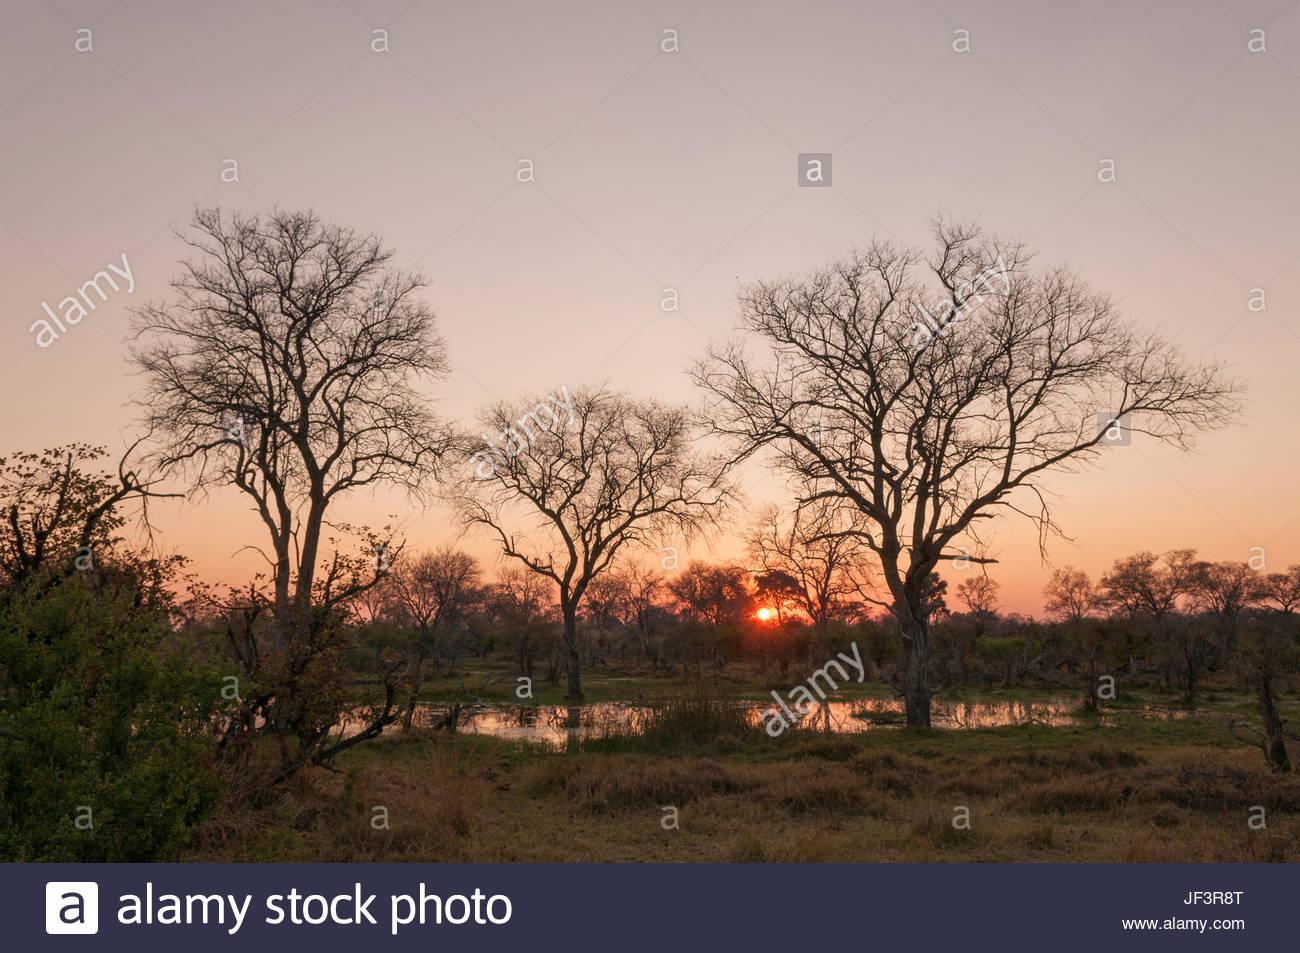 Sunrise over the Okavango delta. - Stock Image